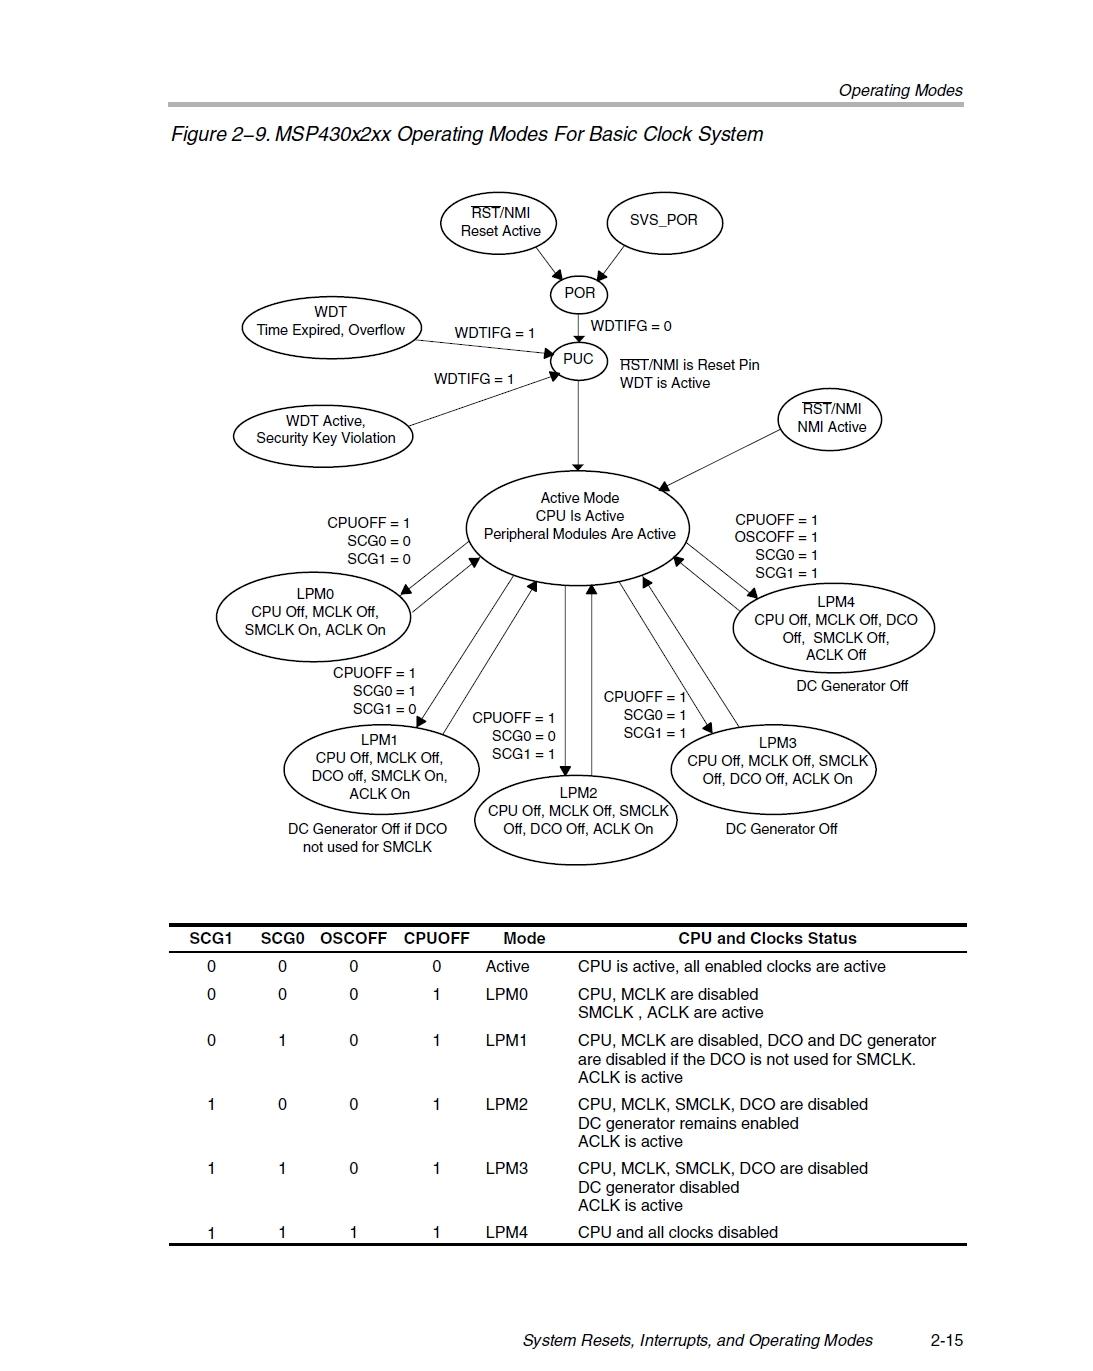 diy-vt100/bookmarks html at master · kuldeepdhaka/diy-vt100 · GitHub